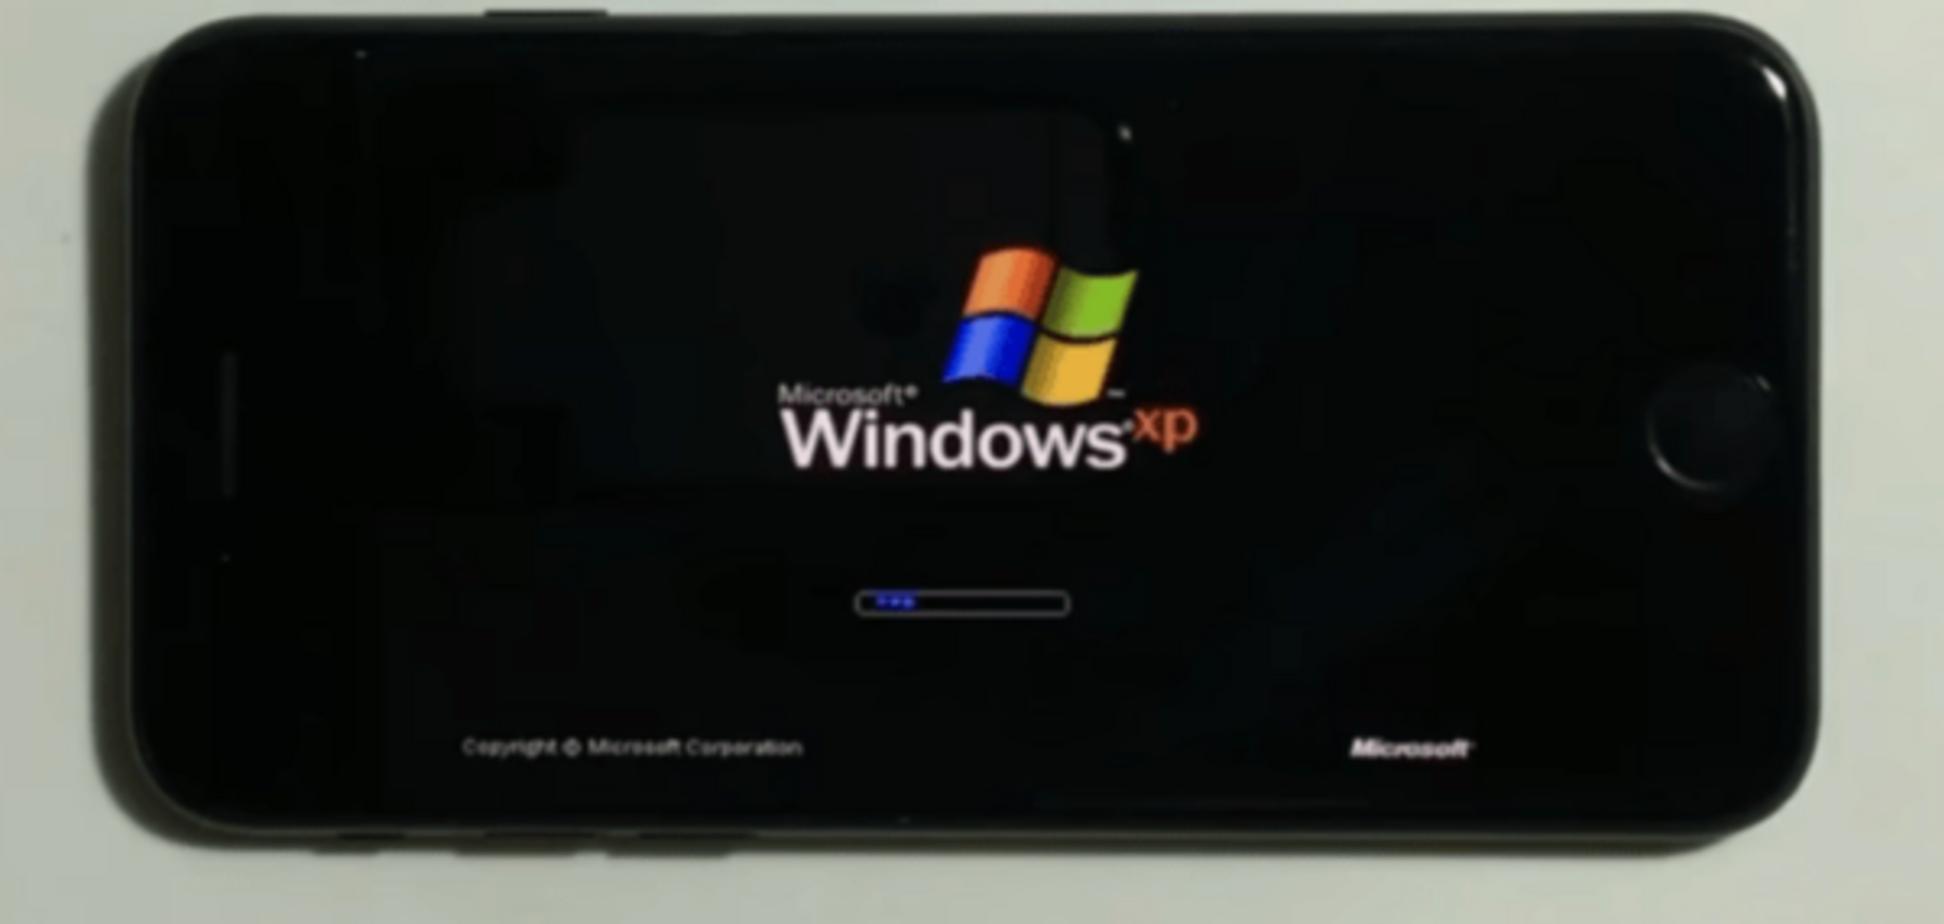 на смартфоне iPhone 7 запустили Windows XP